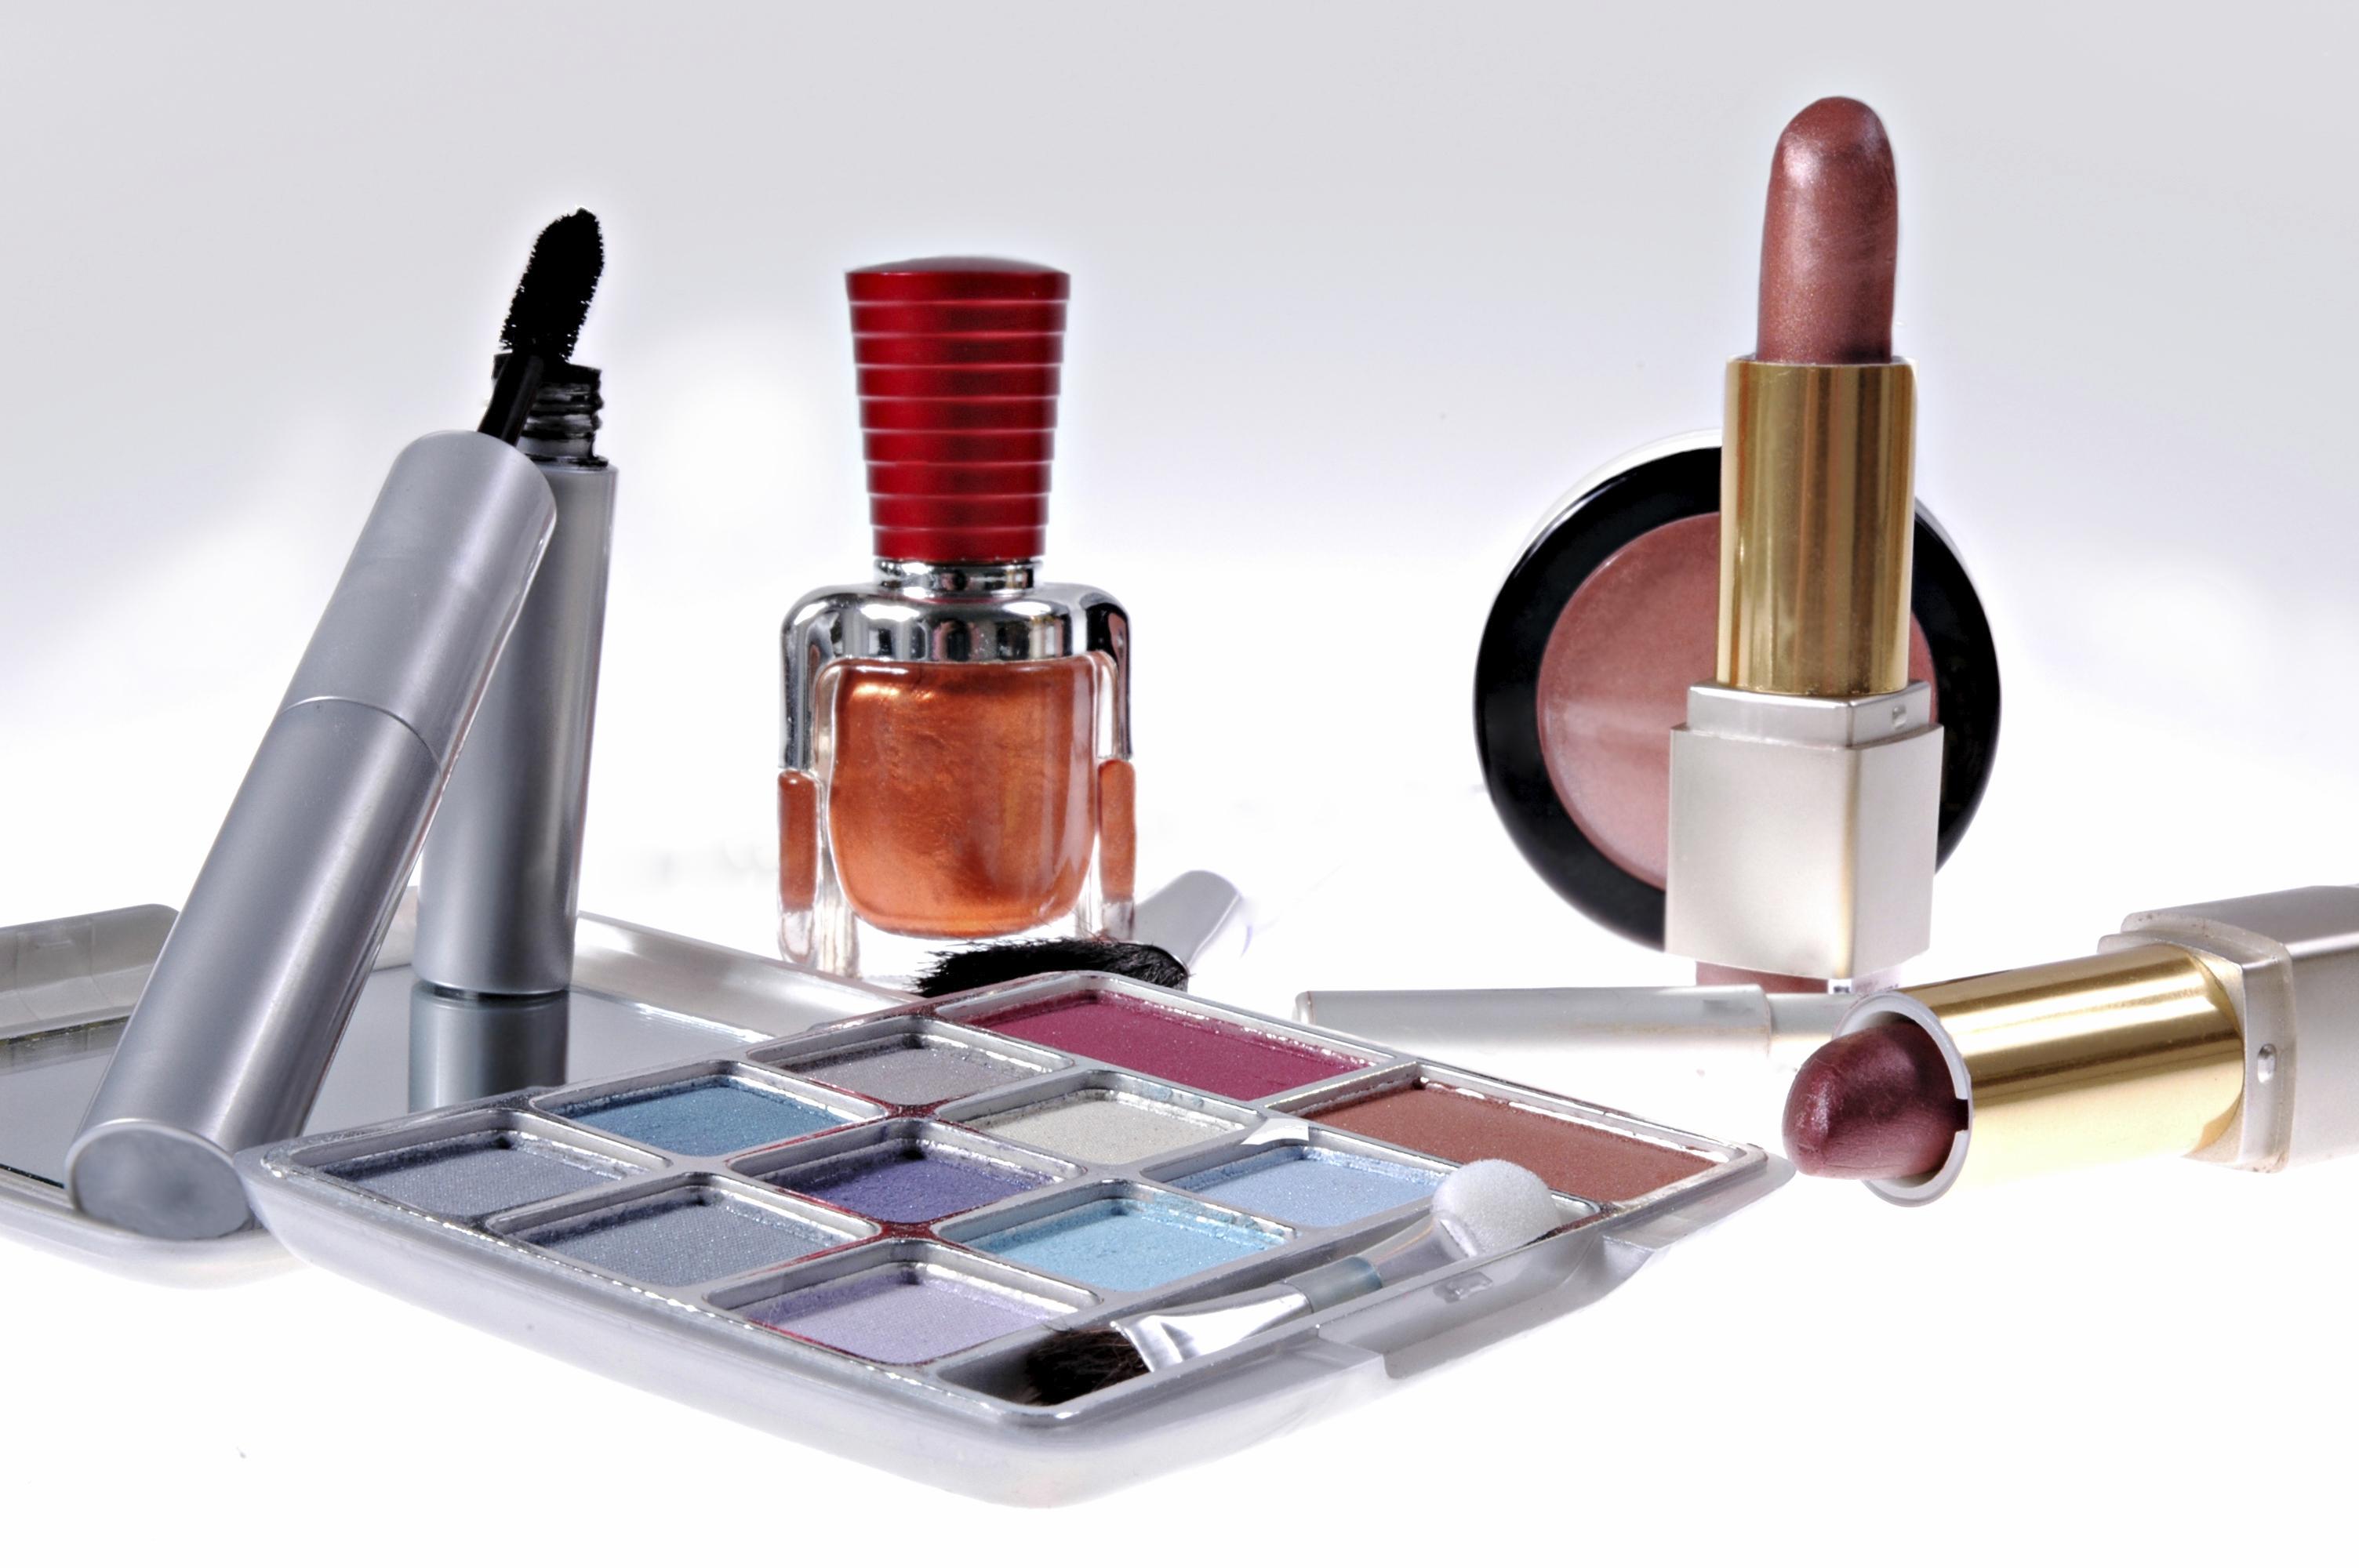 consumer awareness on cosmetics